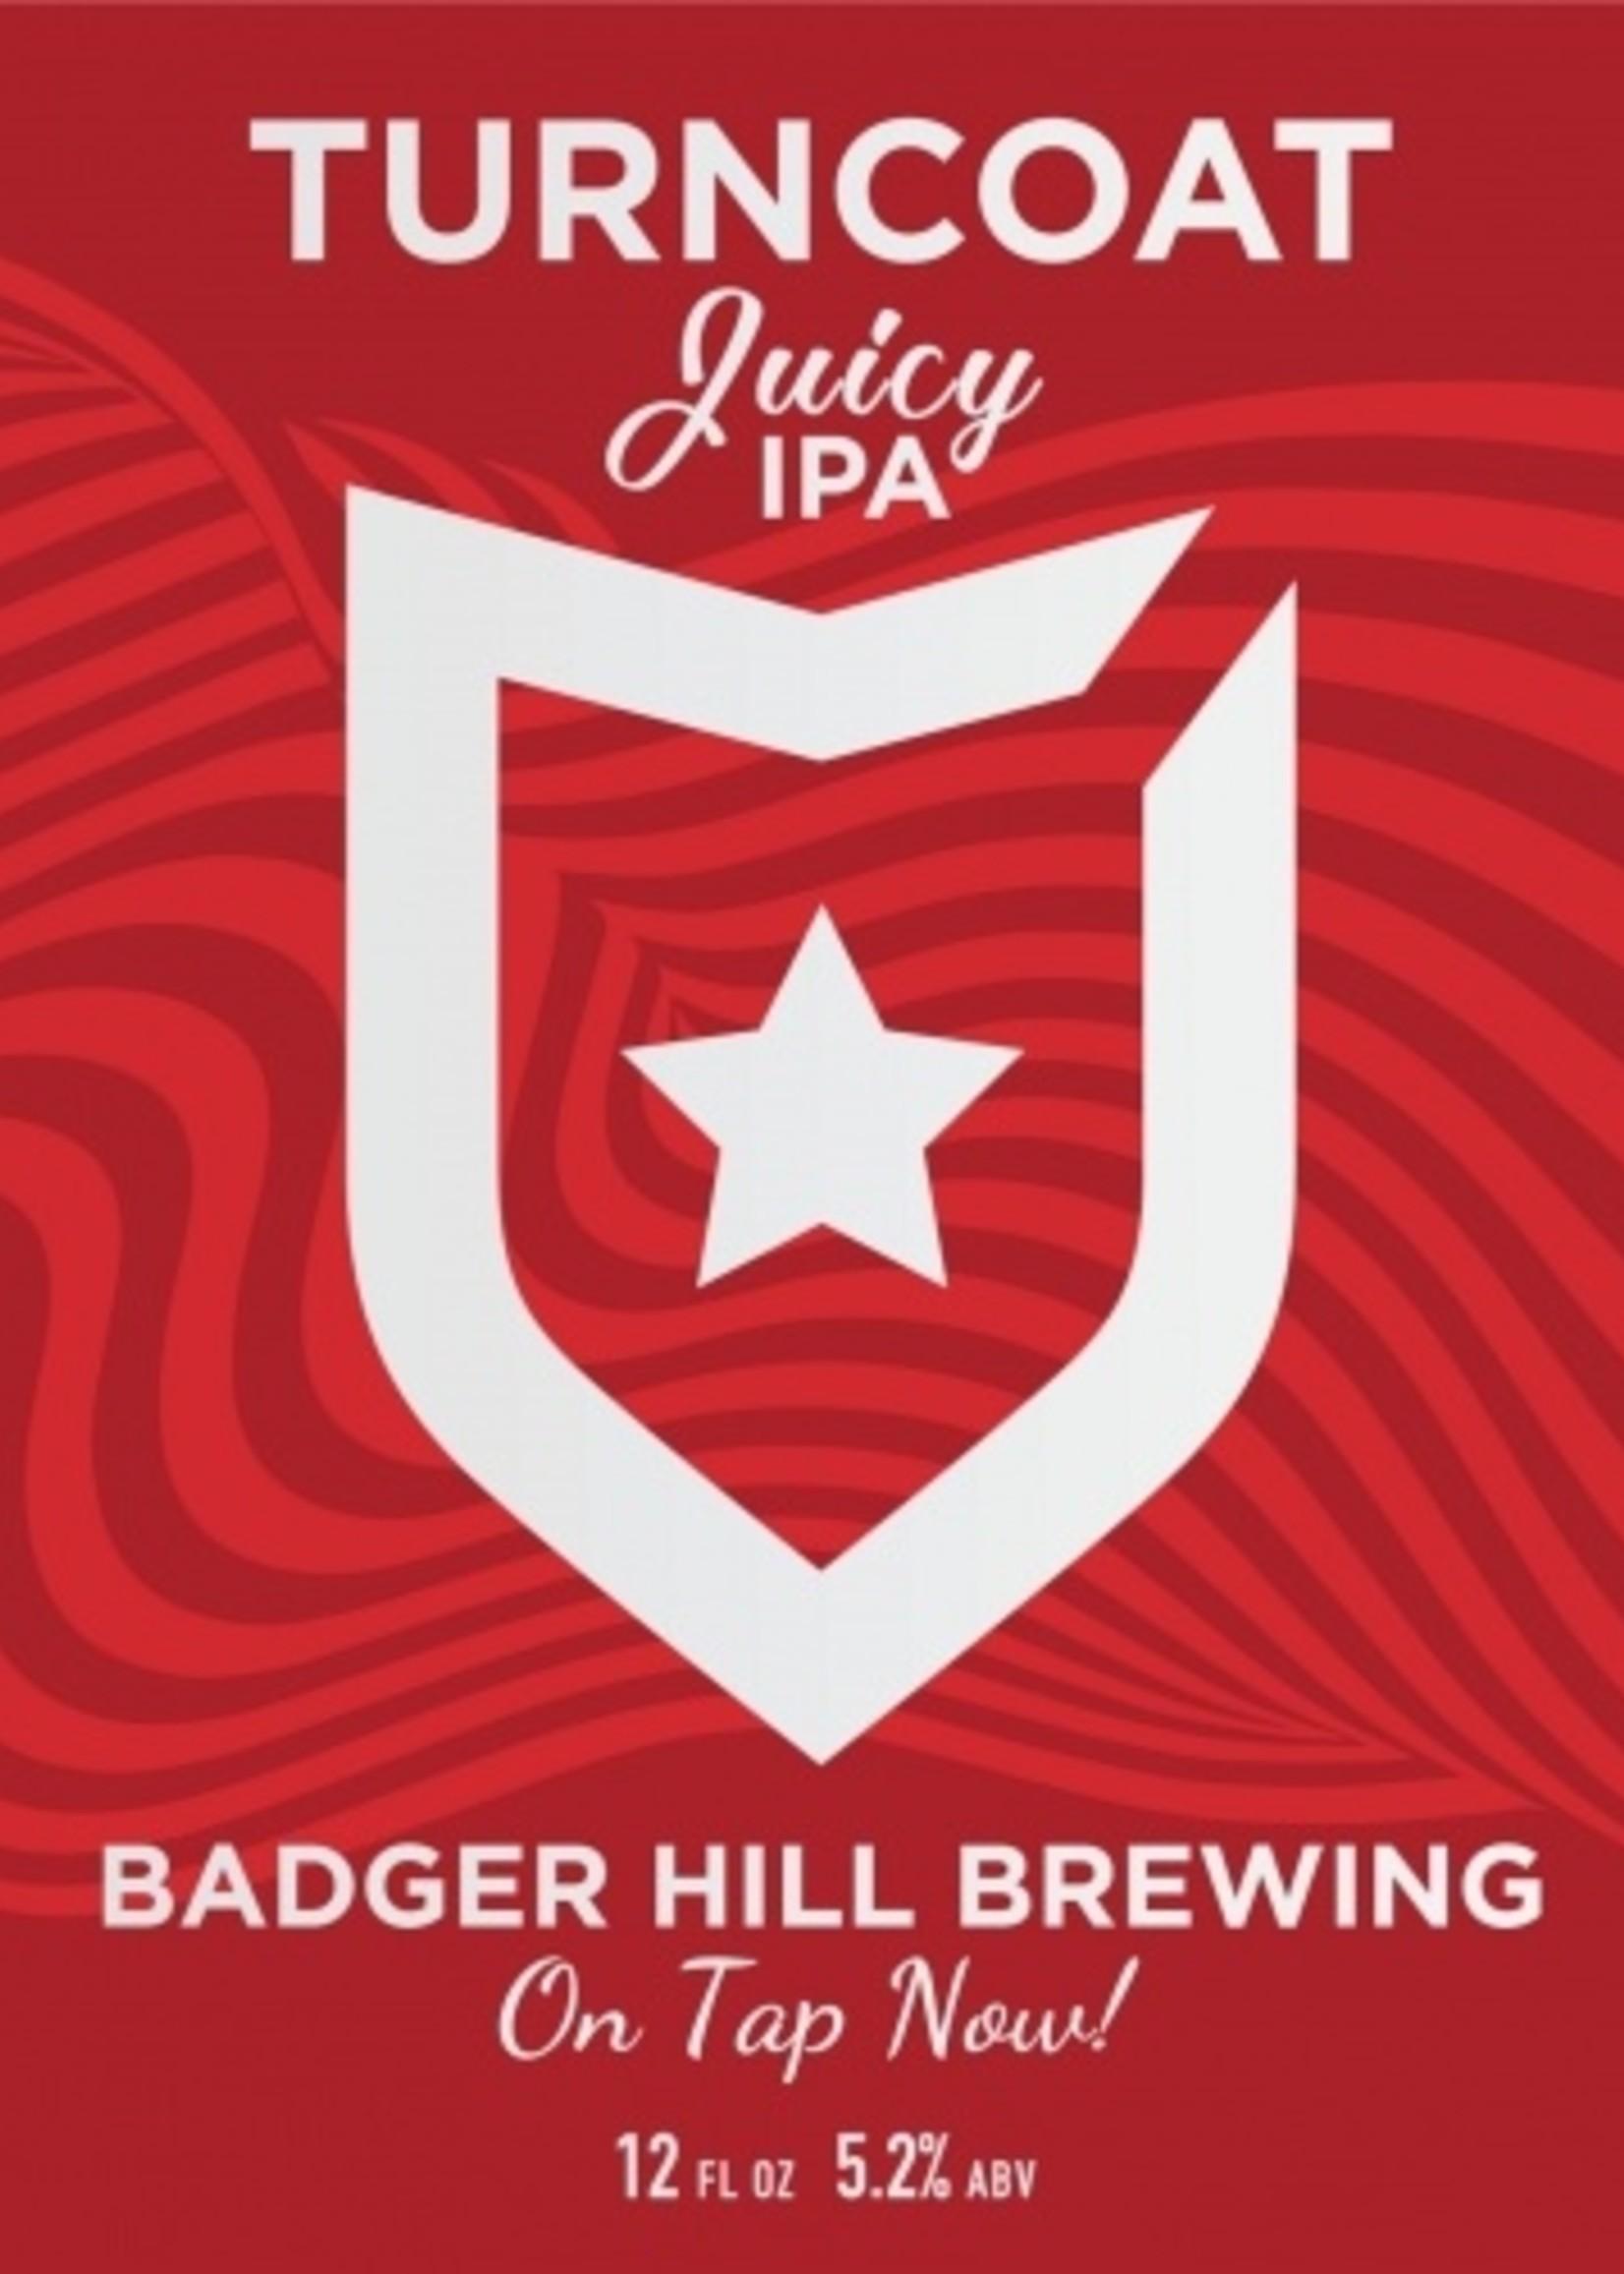 Badger Hill Turncoat Juicy IPA